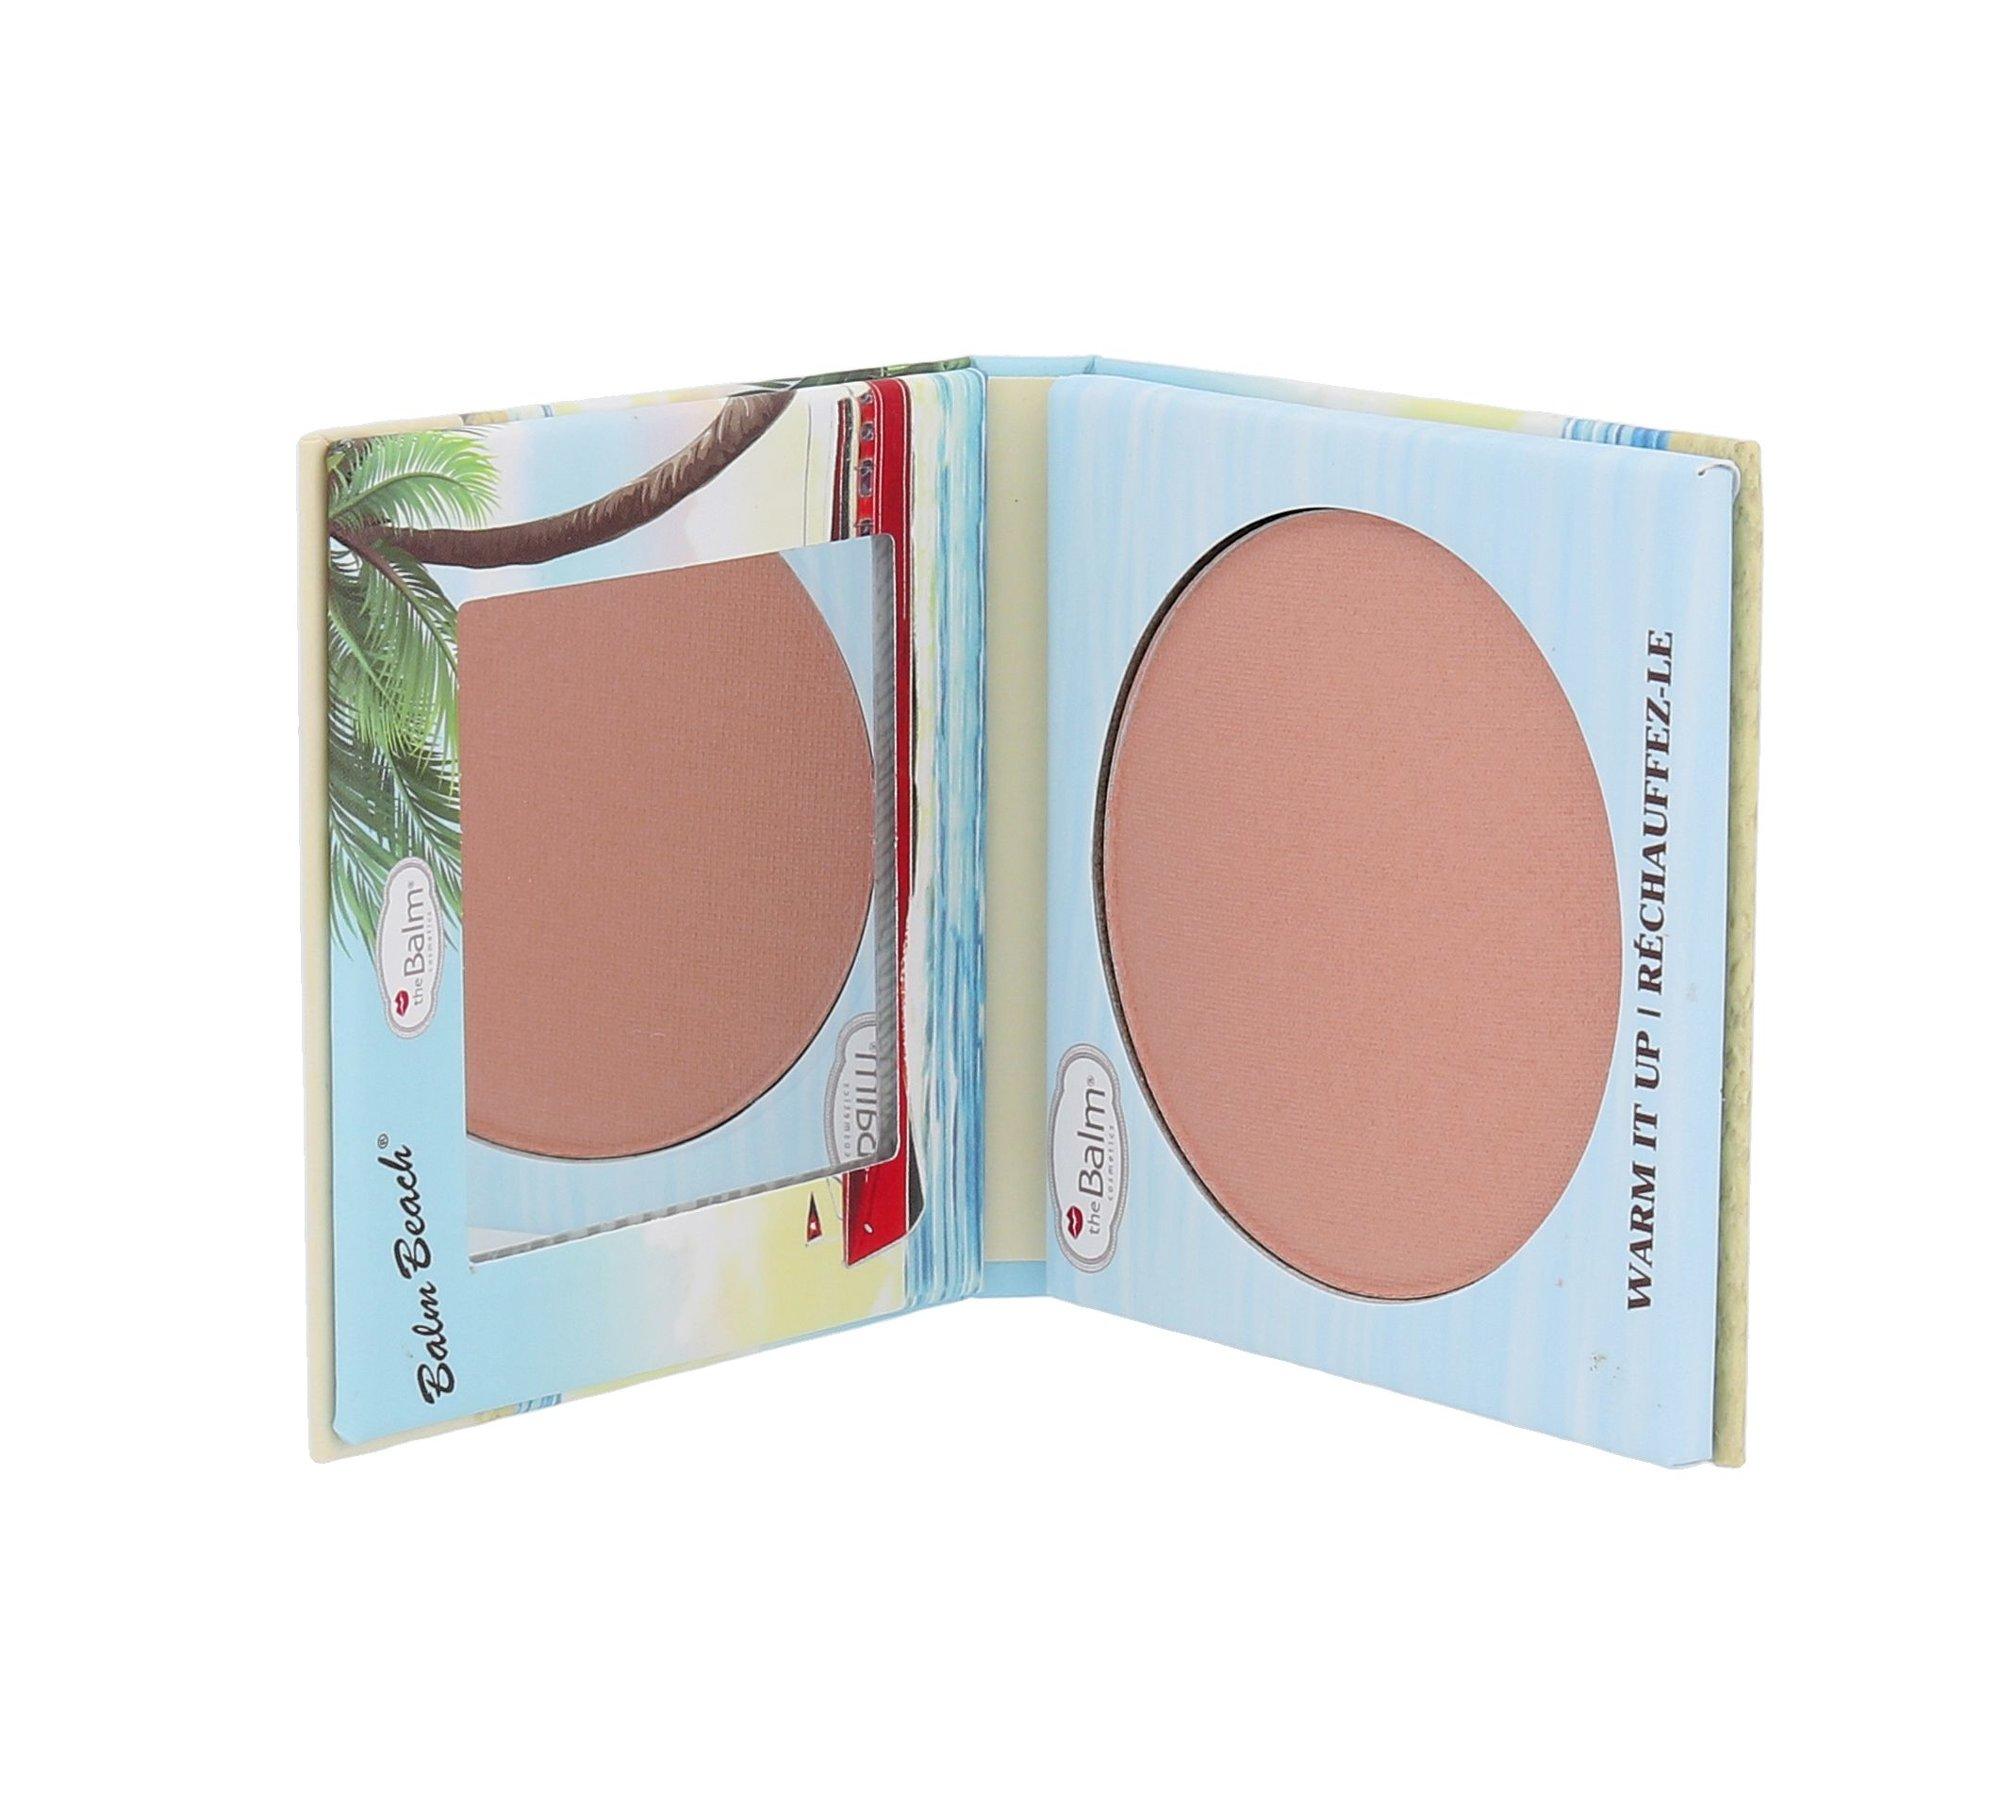 TheBalm Balm Beach Cosmetic 5,576ml